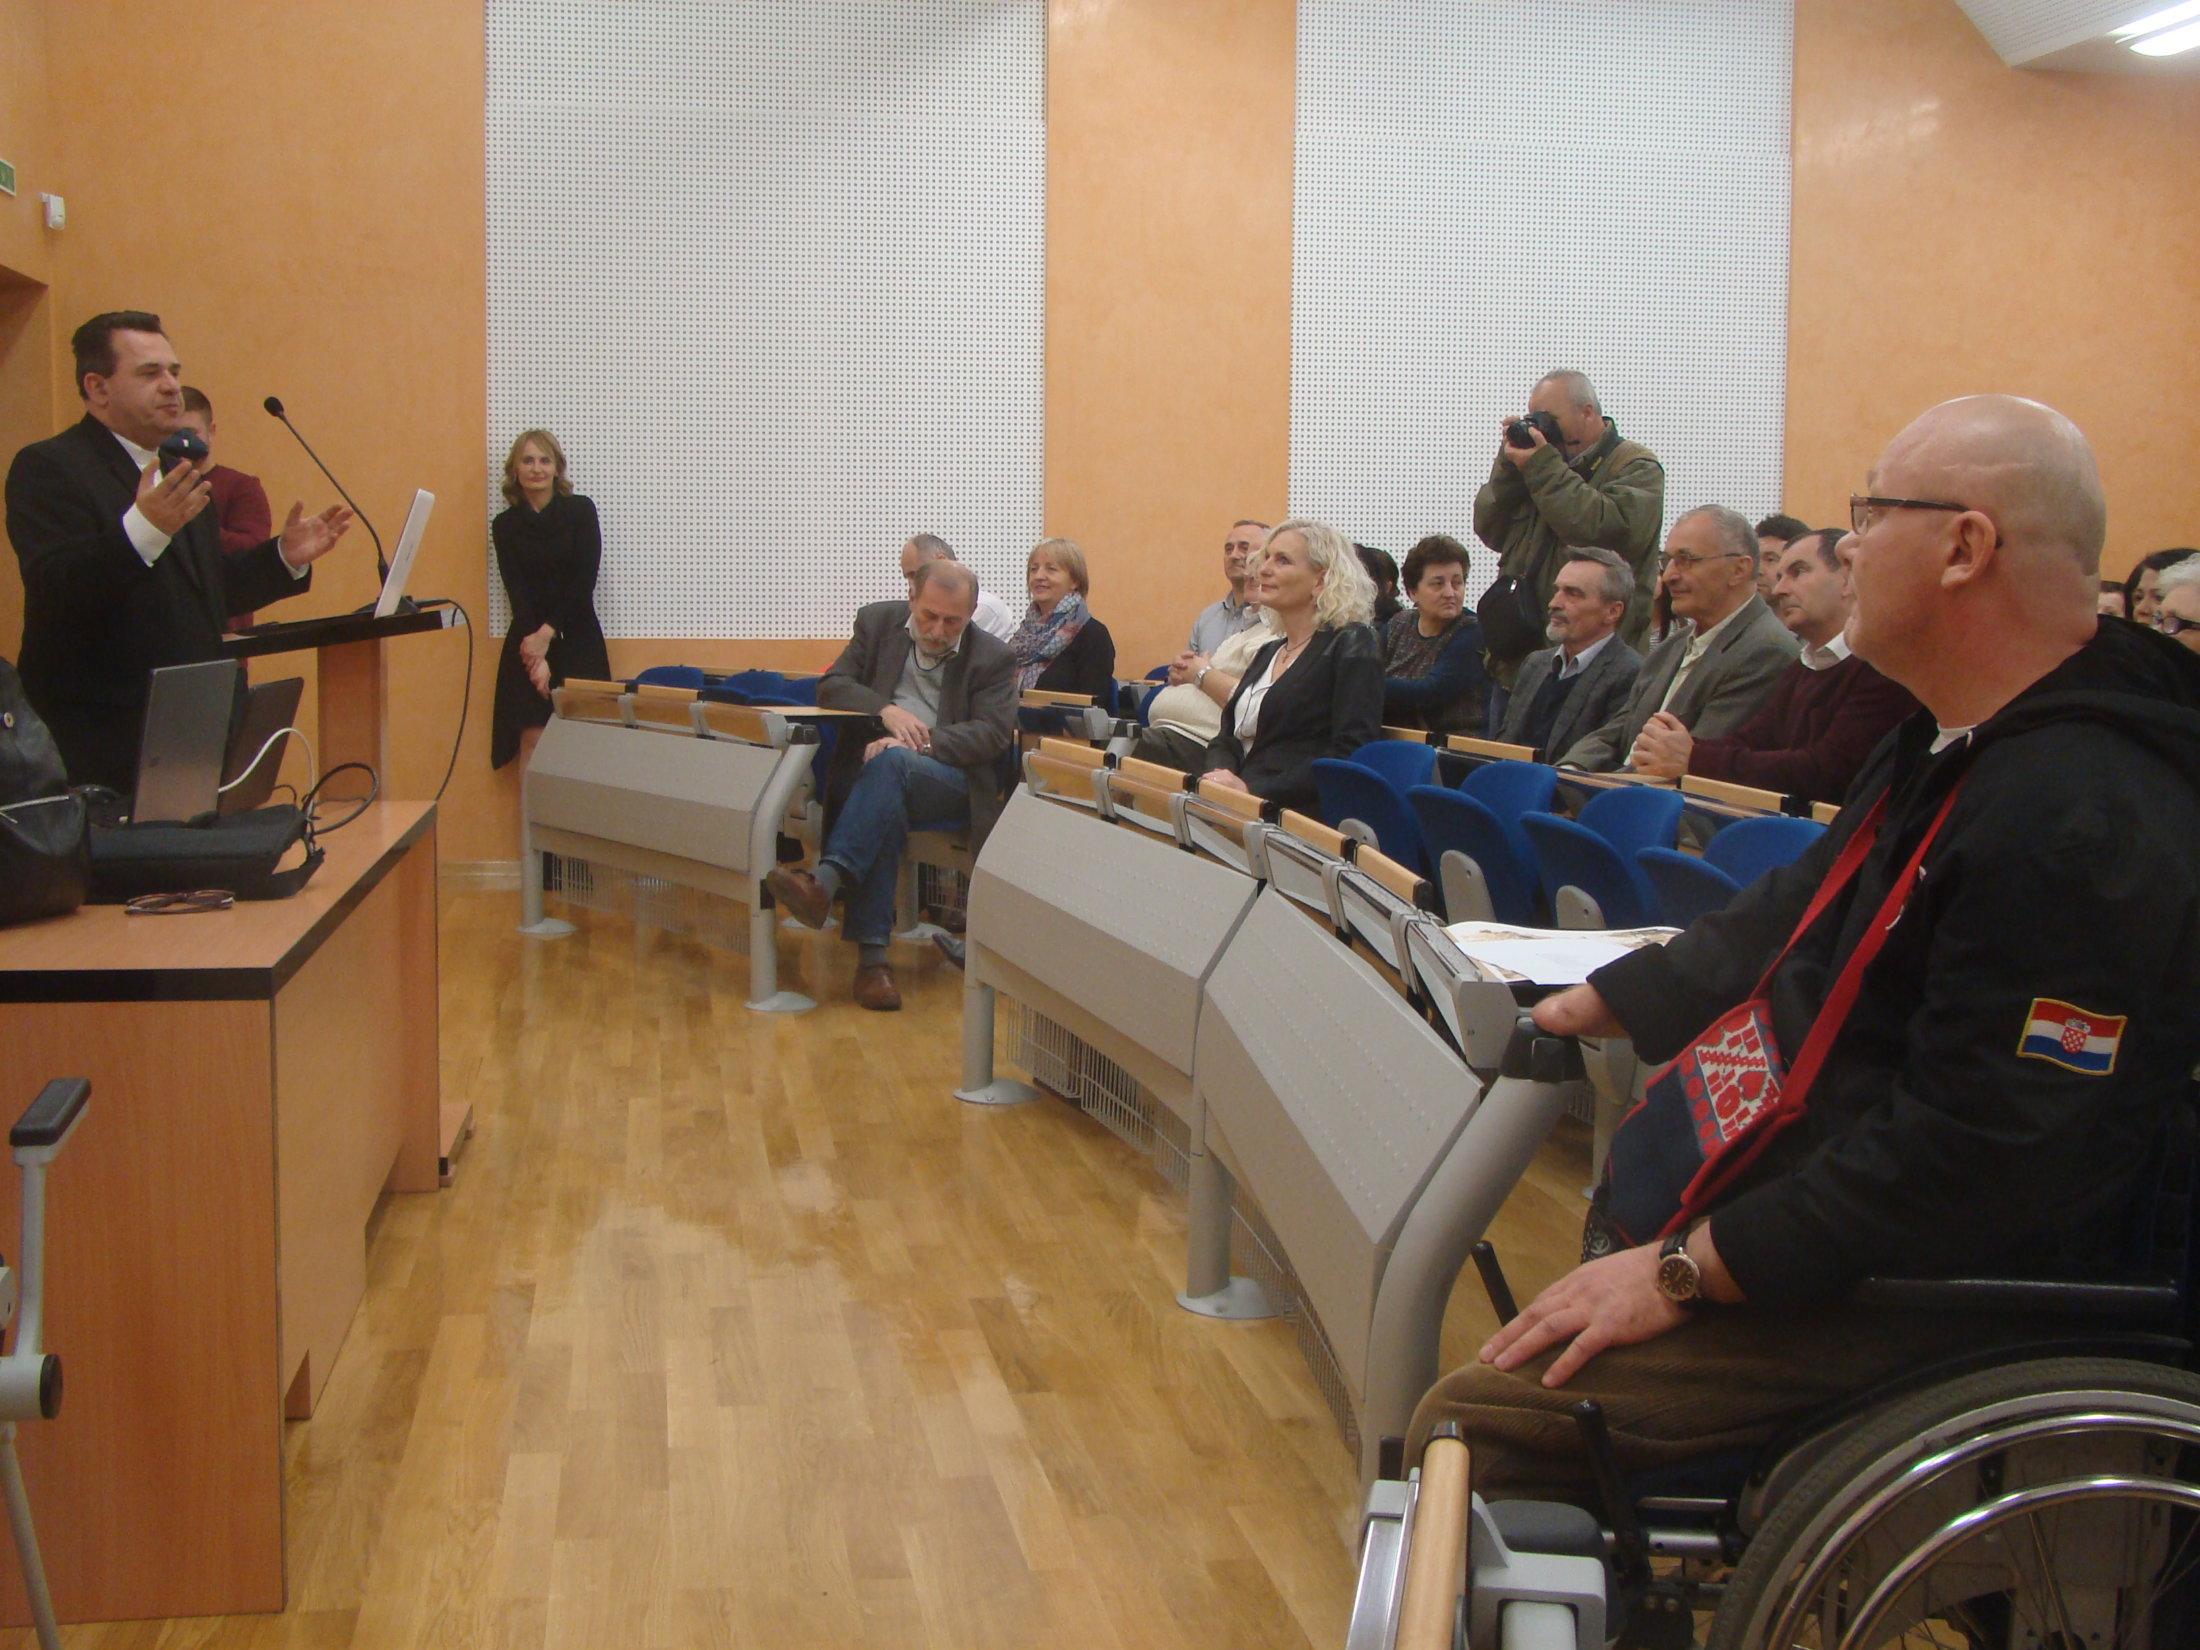 Mons.-Vladimir-Dugalić-pozdravlja-publiku